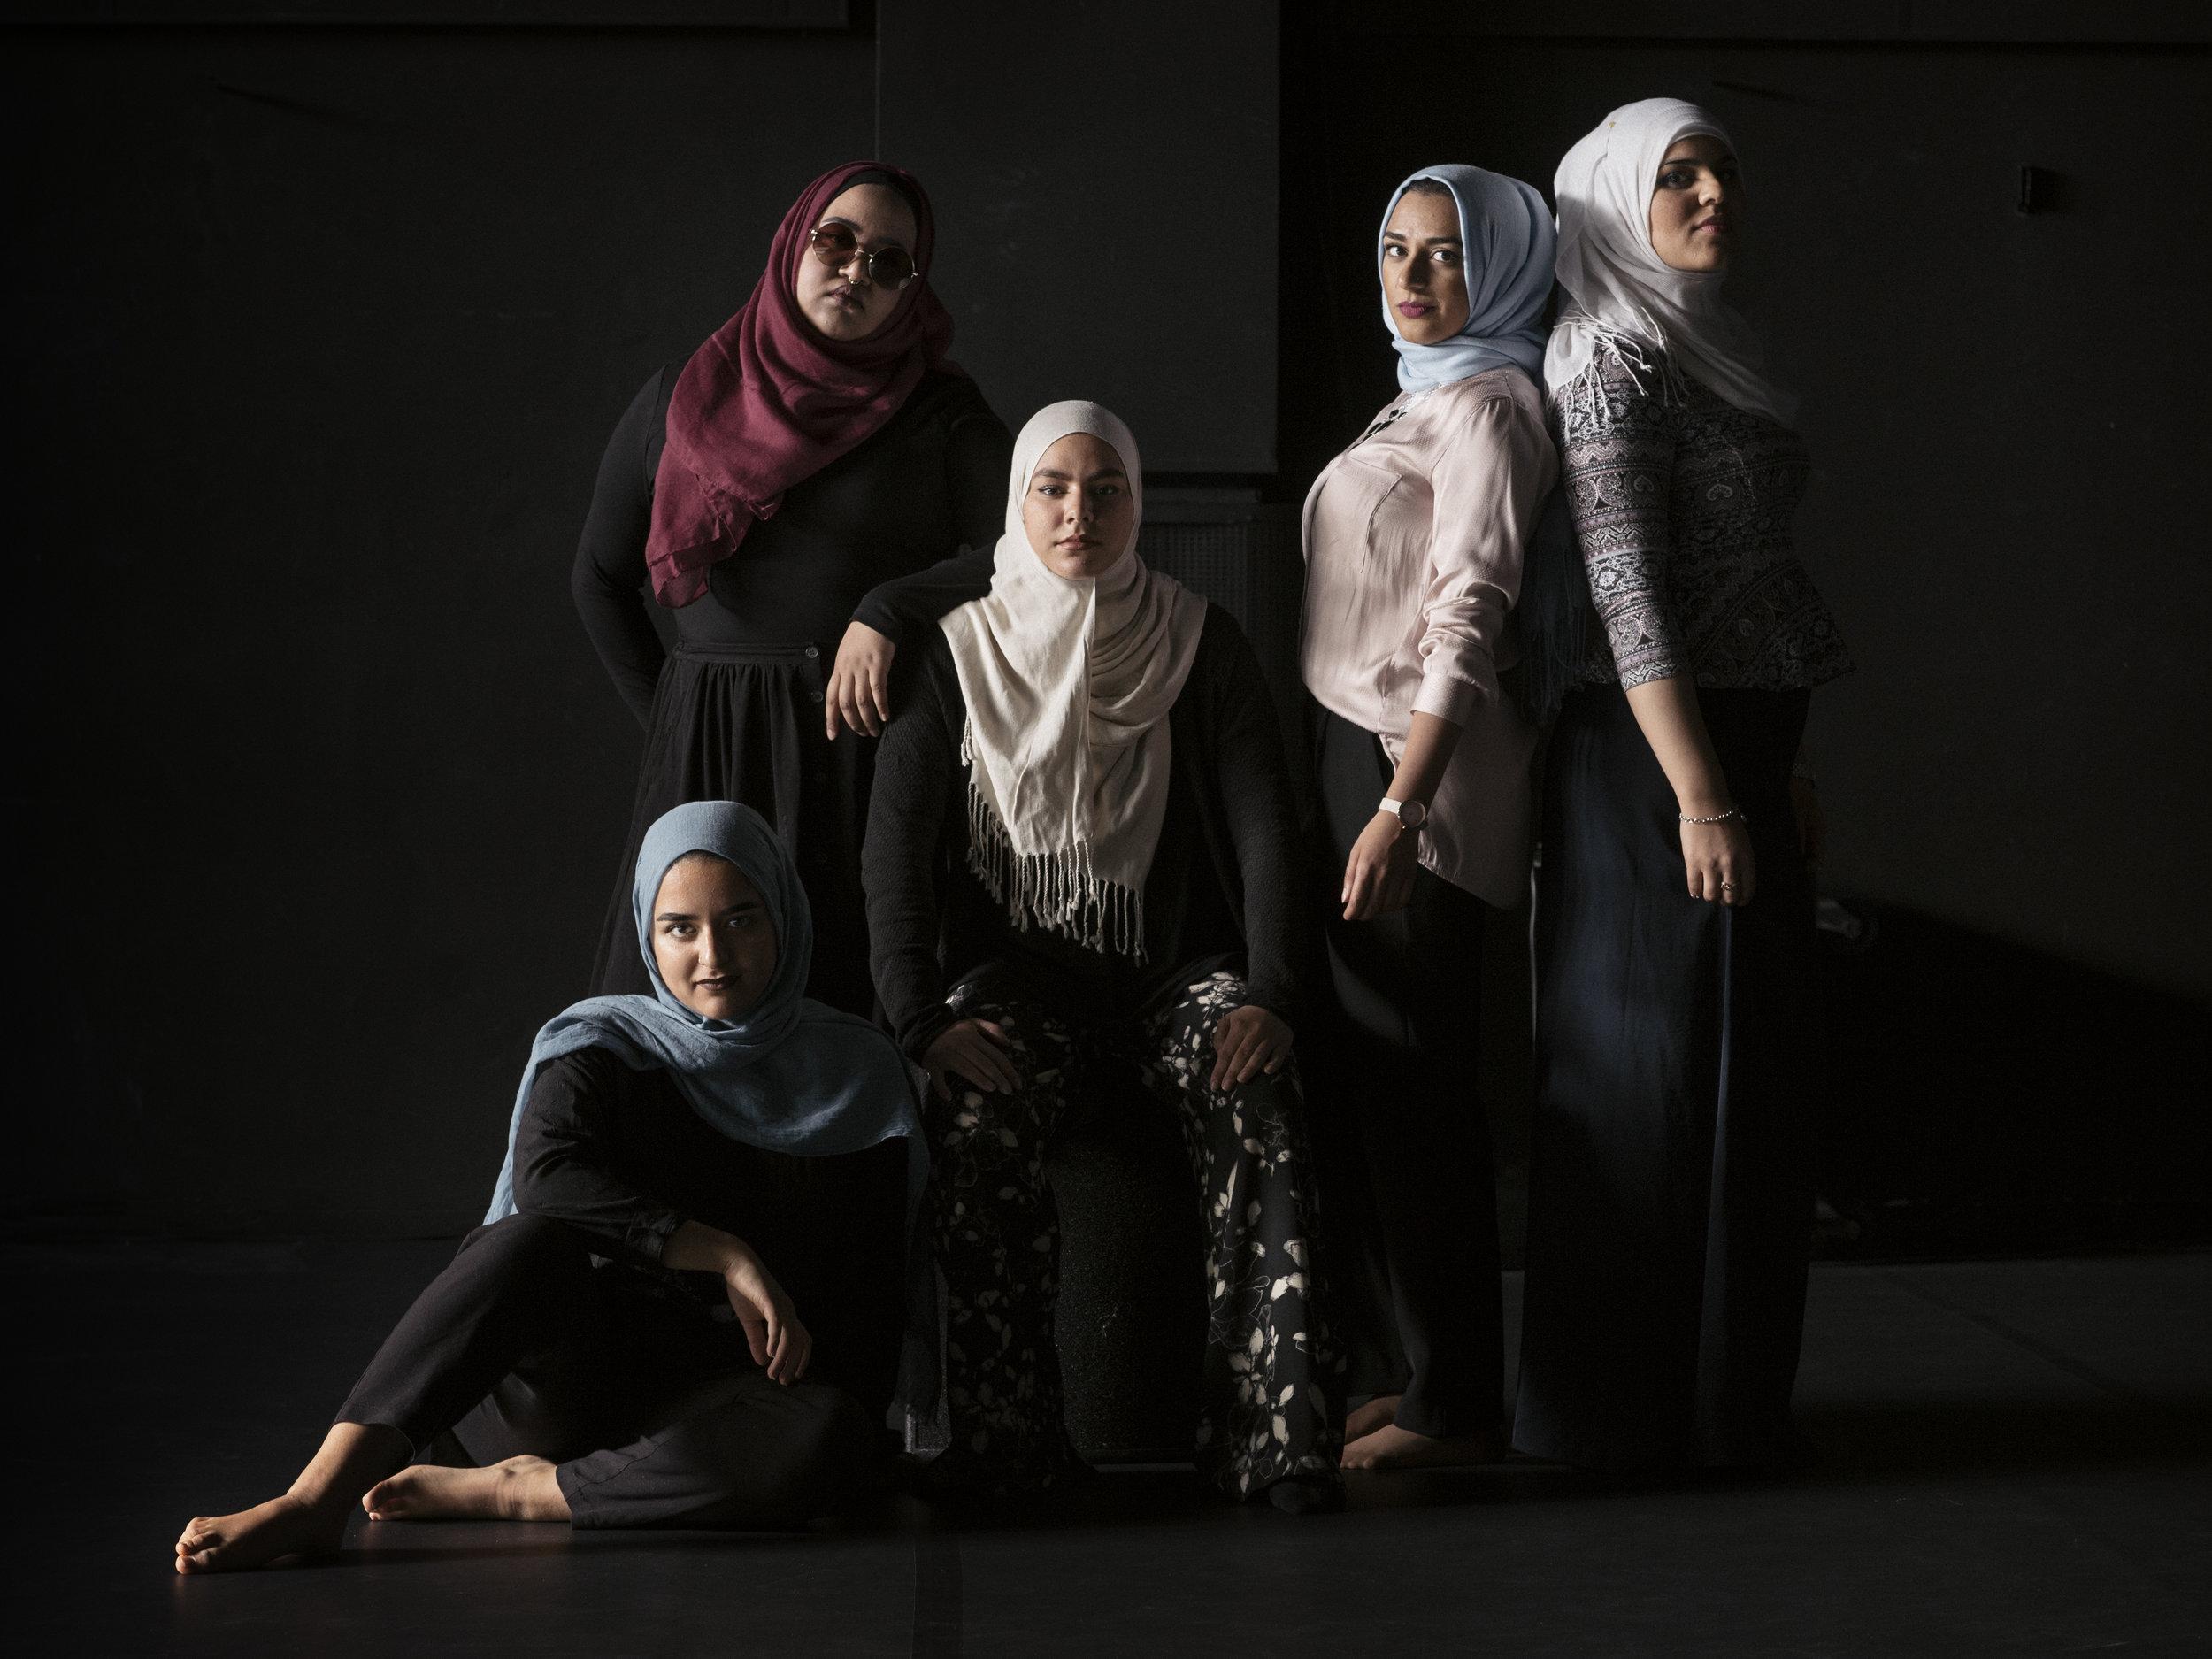 svenska_hijabis_160508_svenska_hijabis_160508__MG_8928_EBE_EBE.jpg